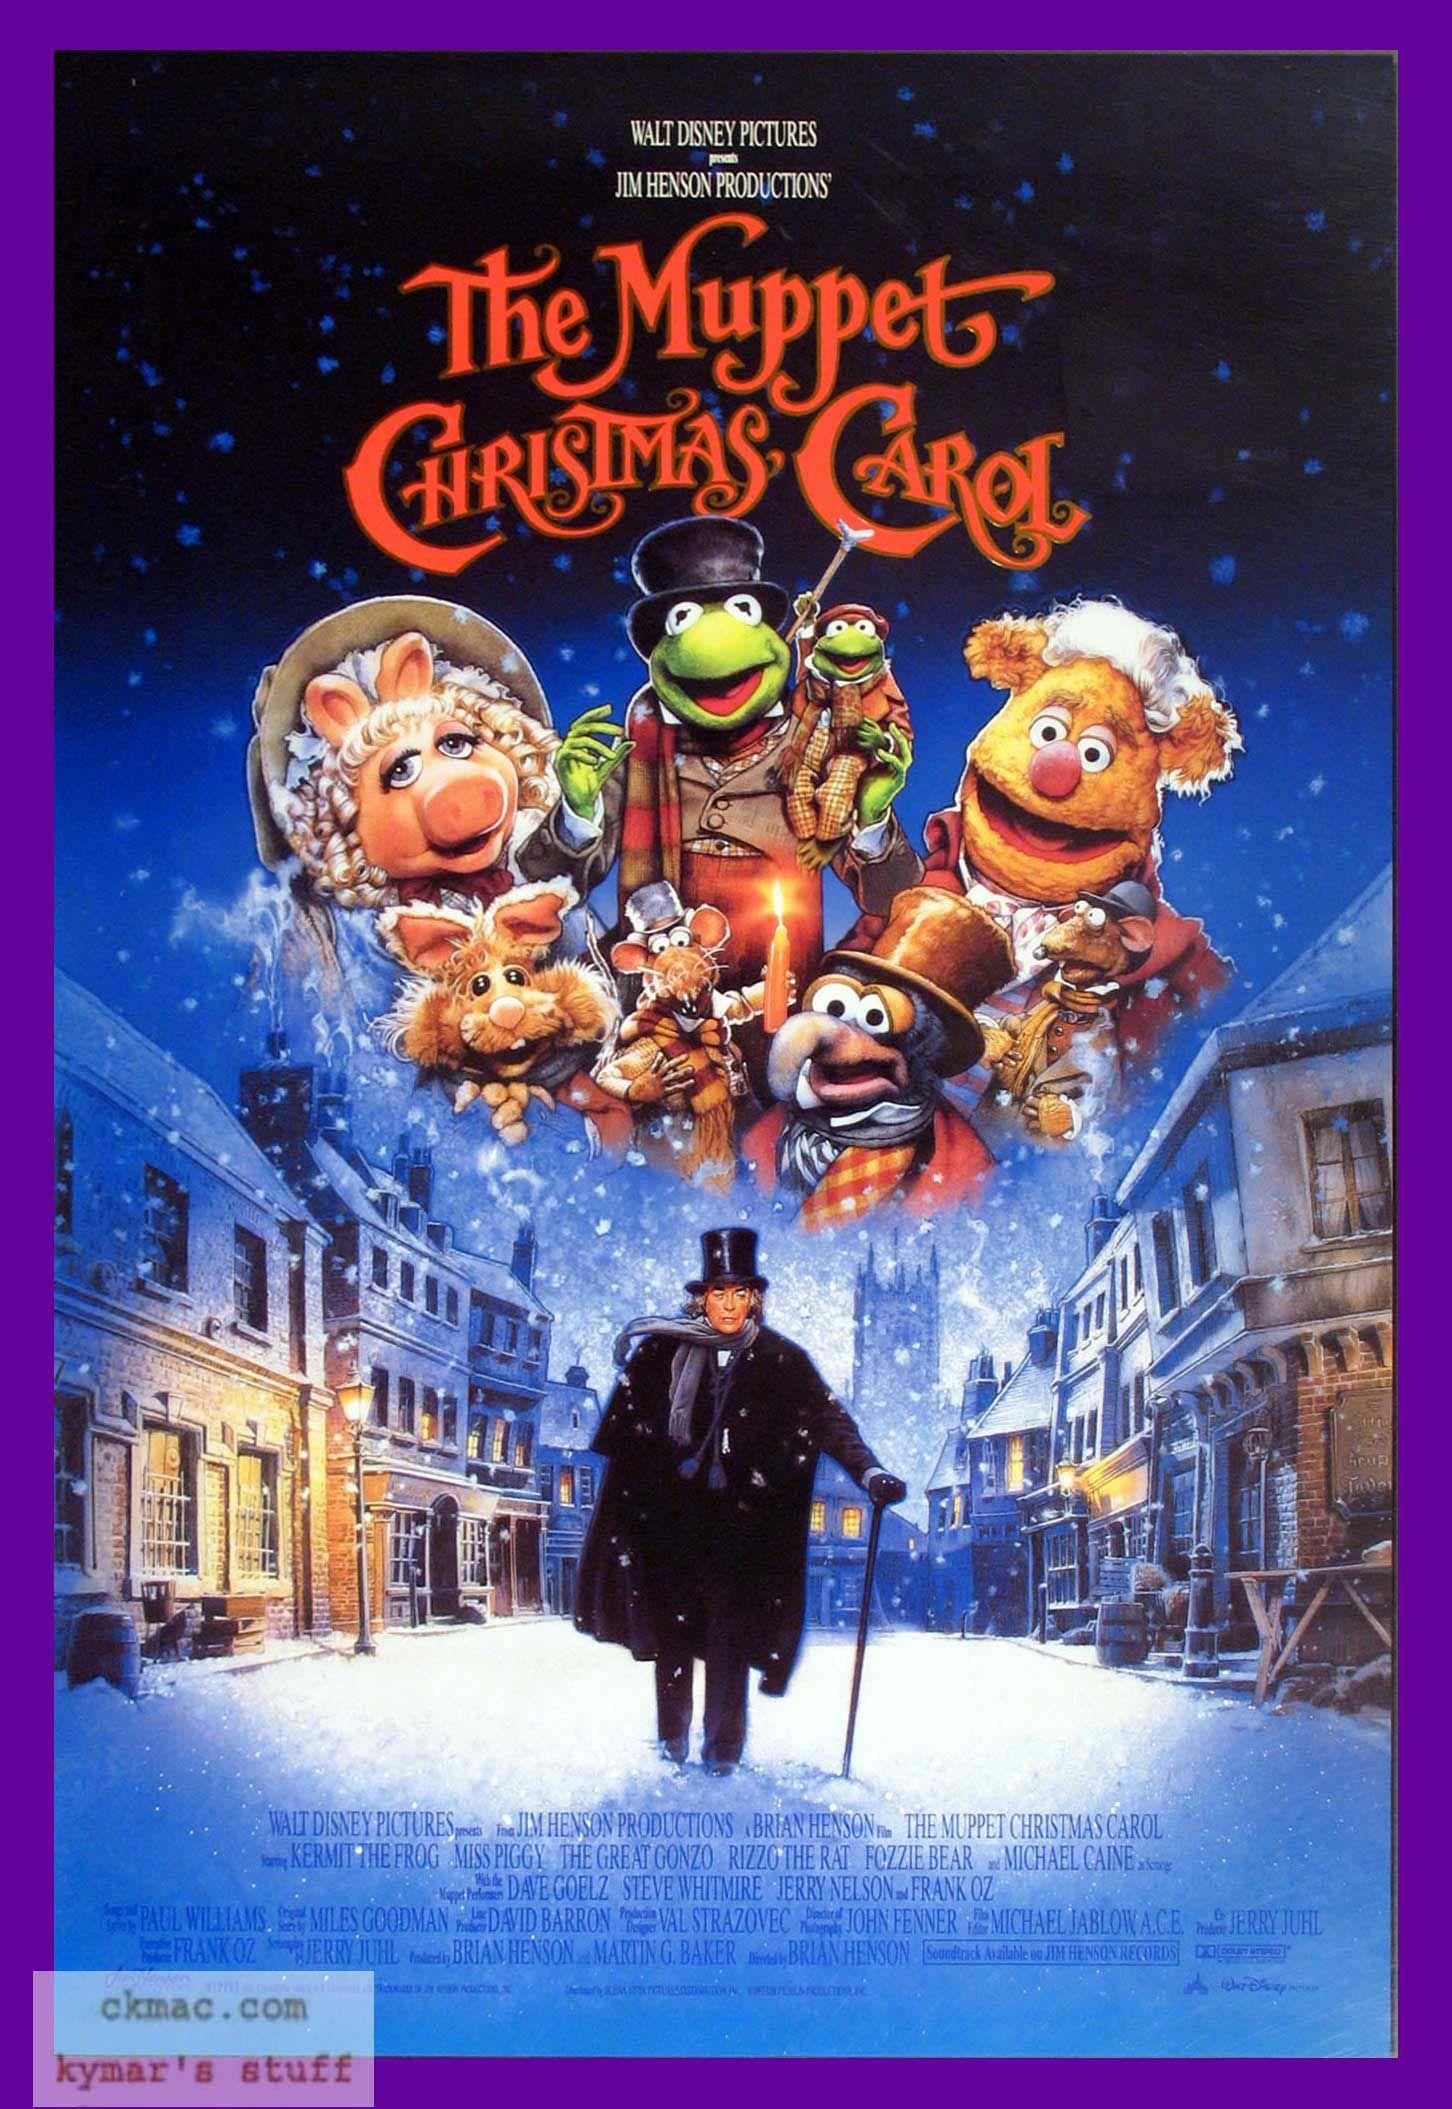 'The Muppet Christmas Carol' (1992) | Muppets christmas, Best christmas movies, Christmas movies